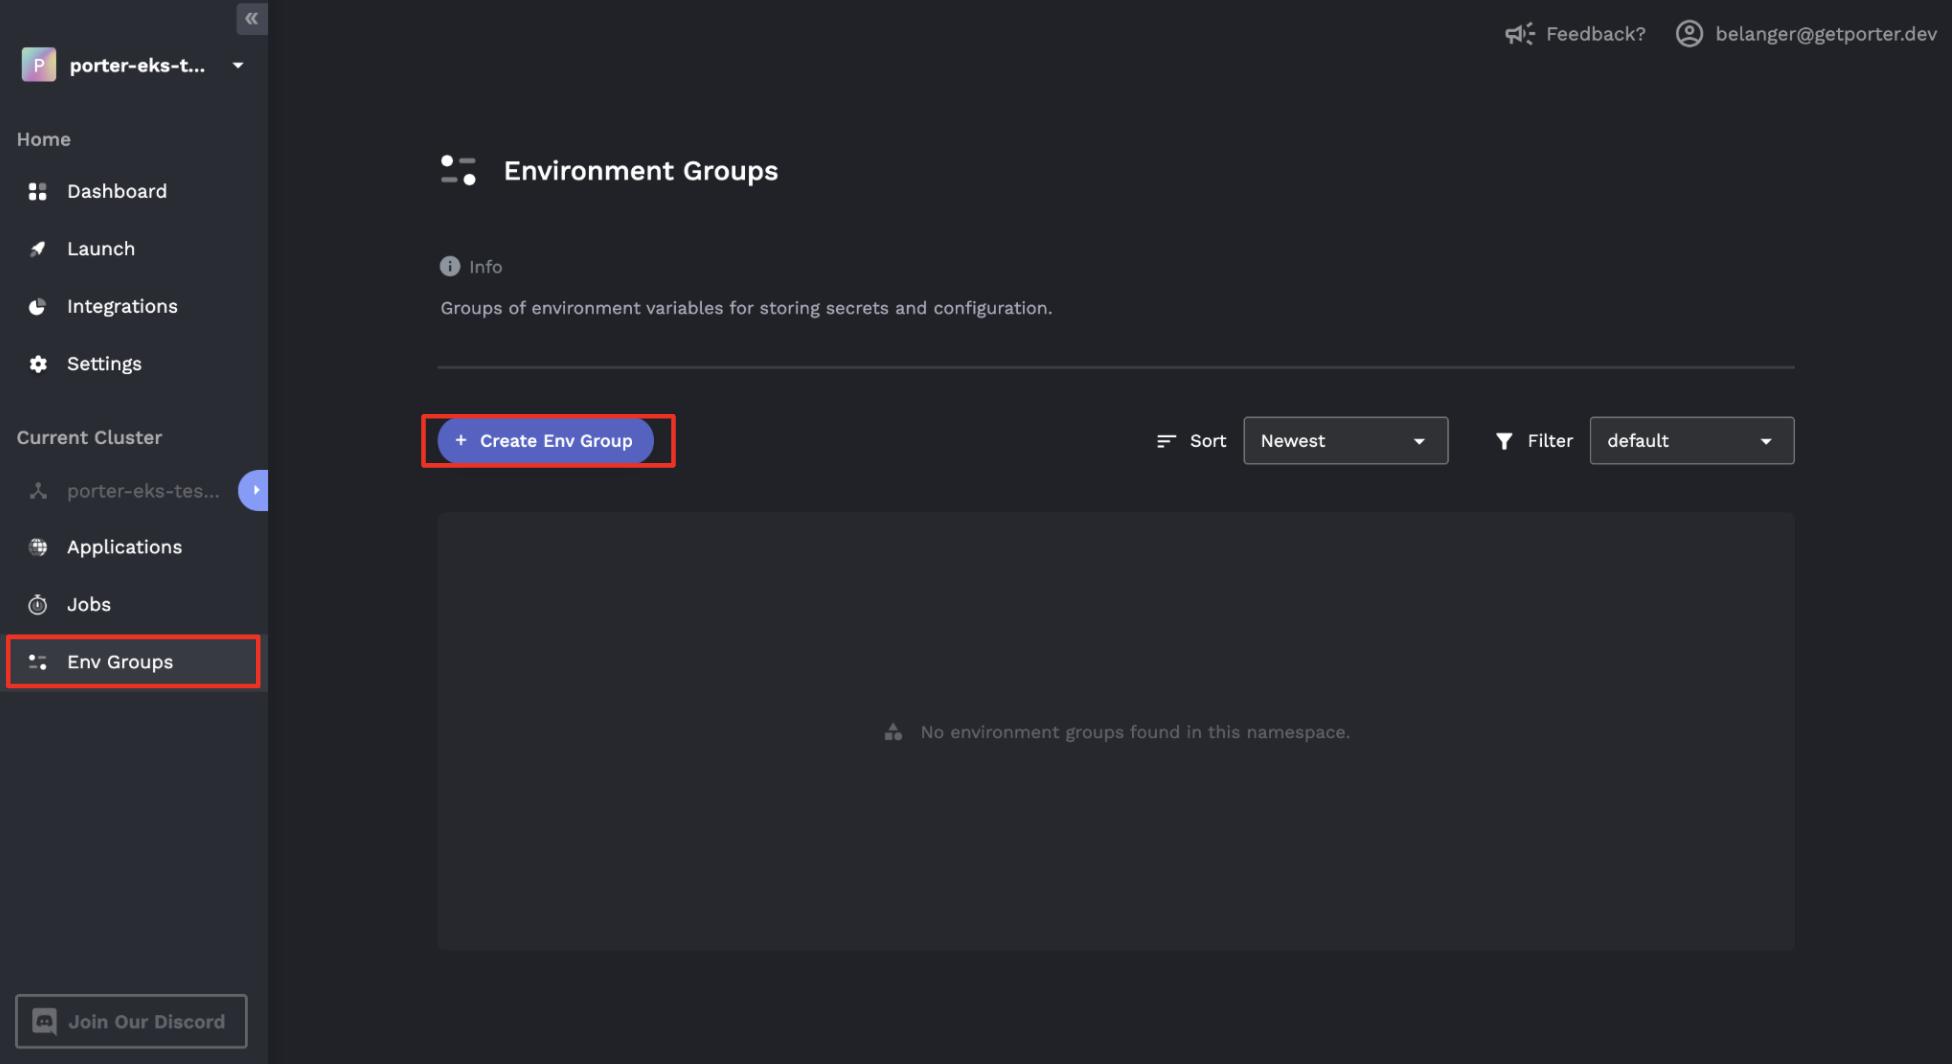 Create env group